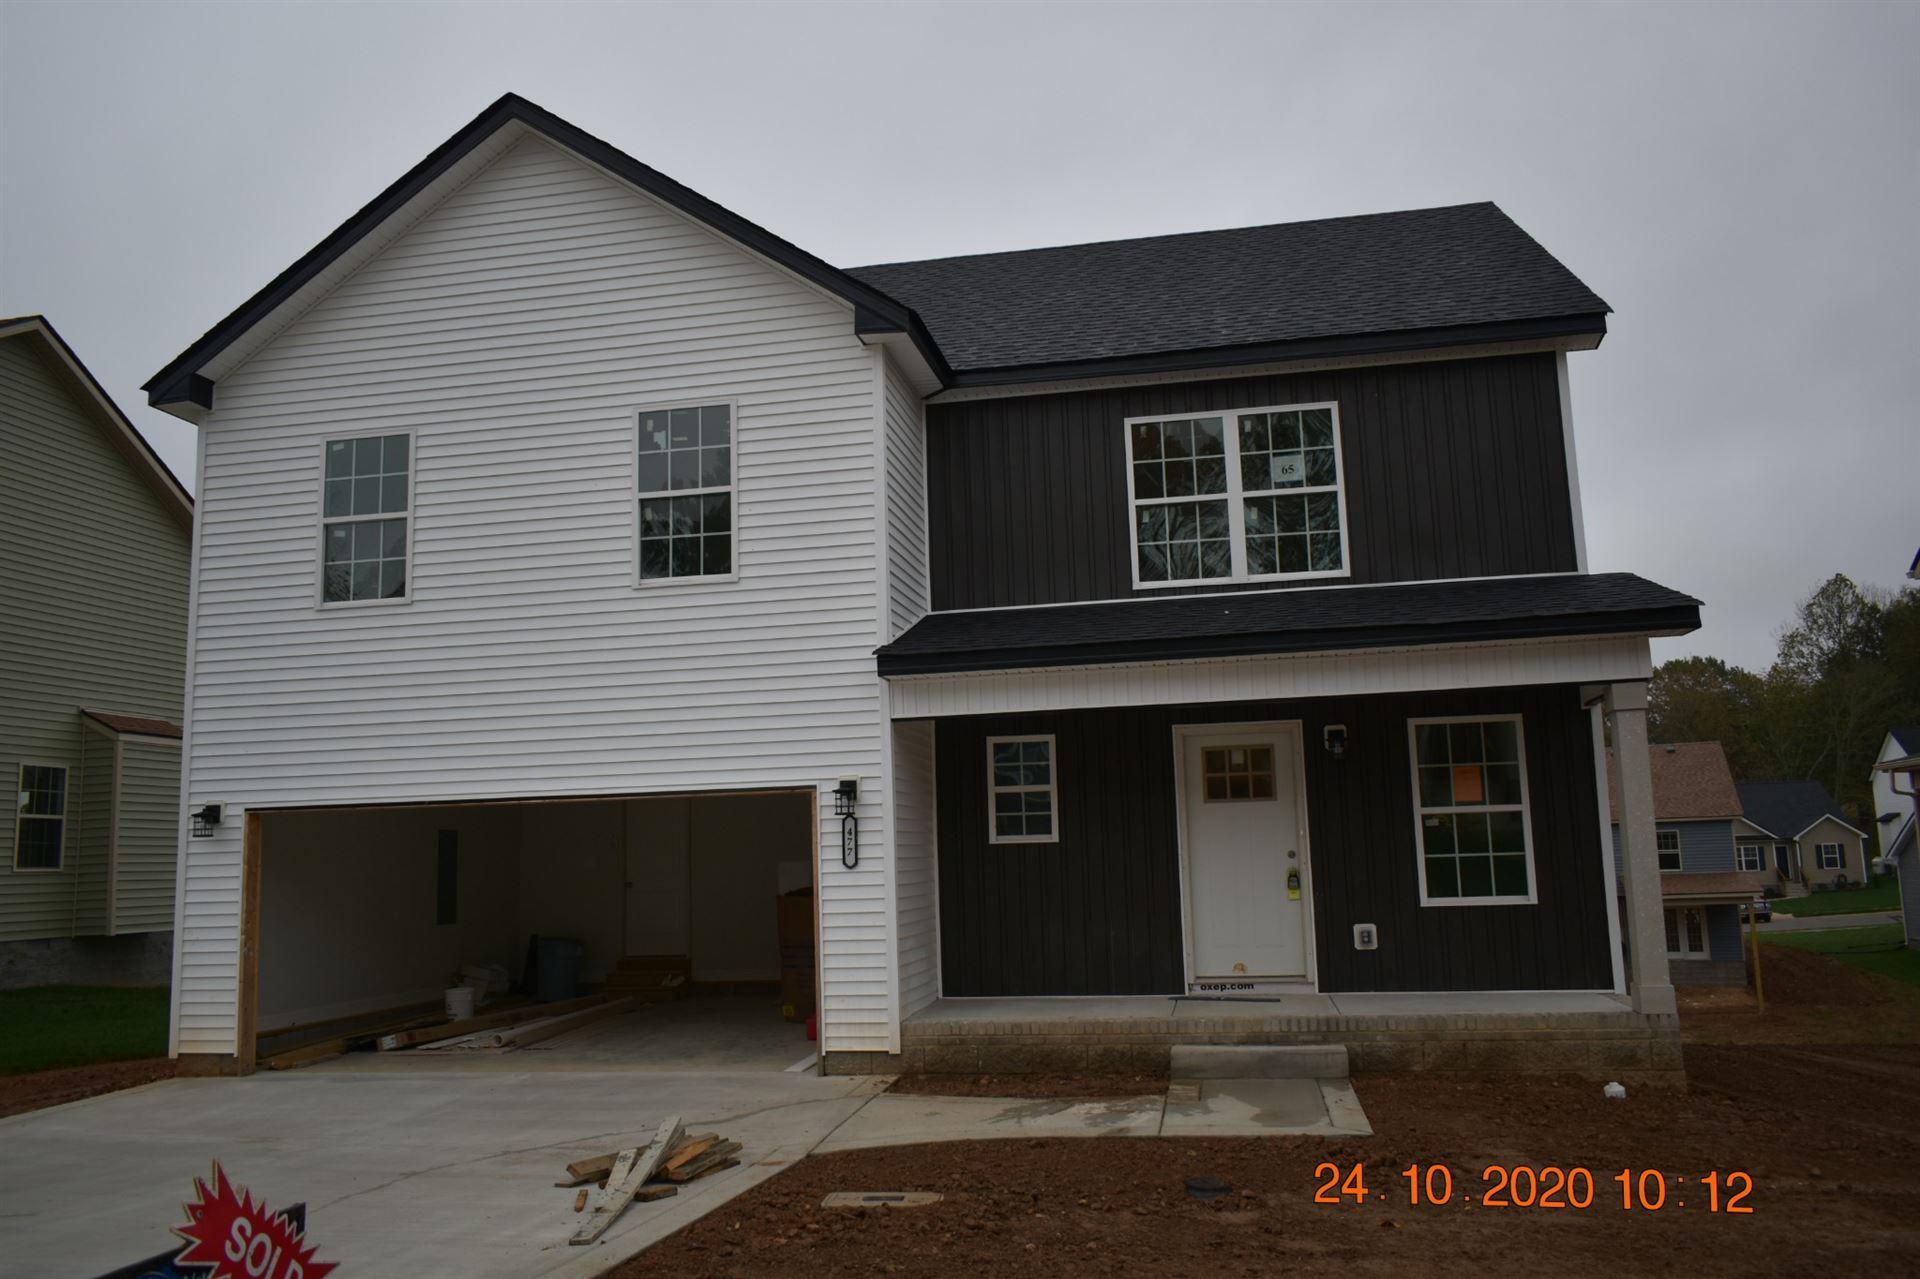 65 Chestnut Hill, Clarksville, TN 37042 - MLS#: 2156046